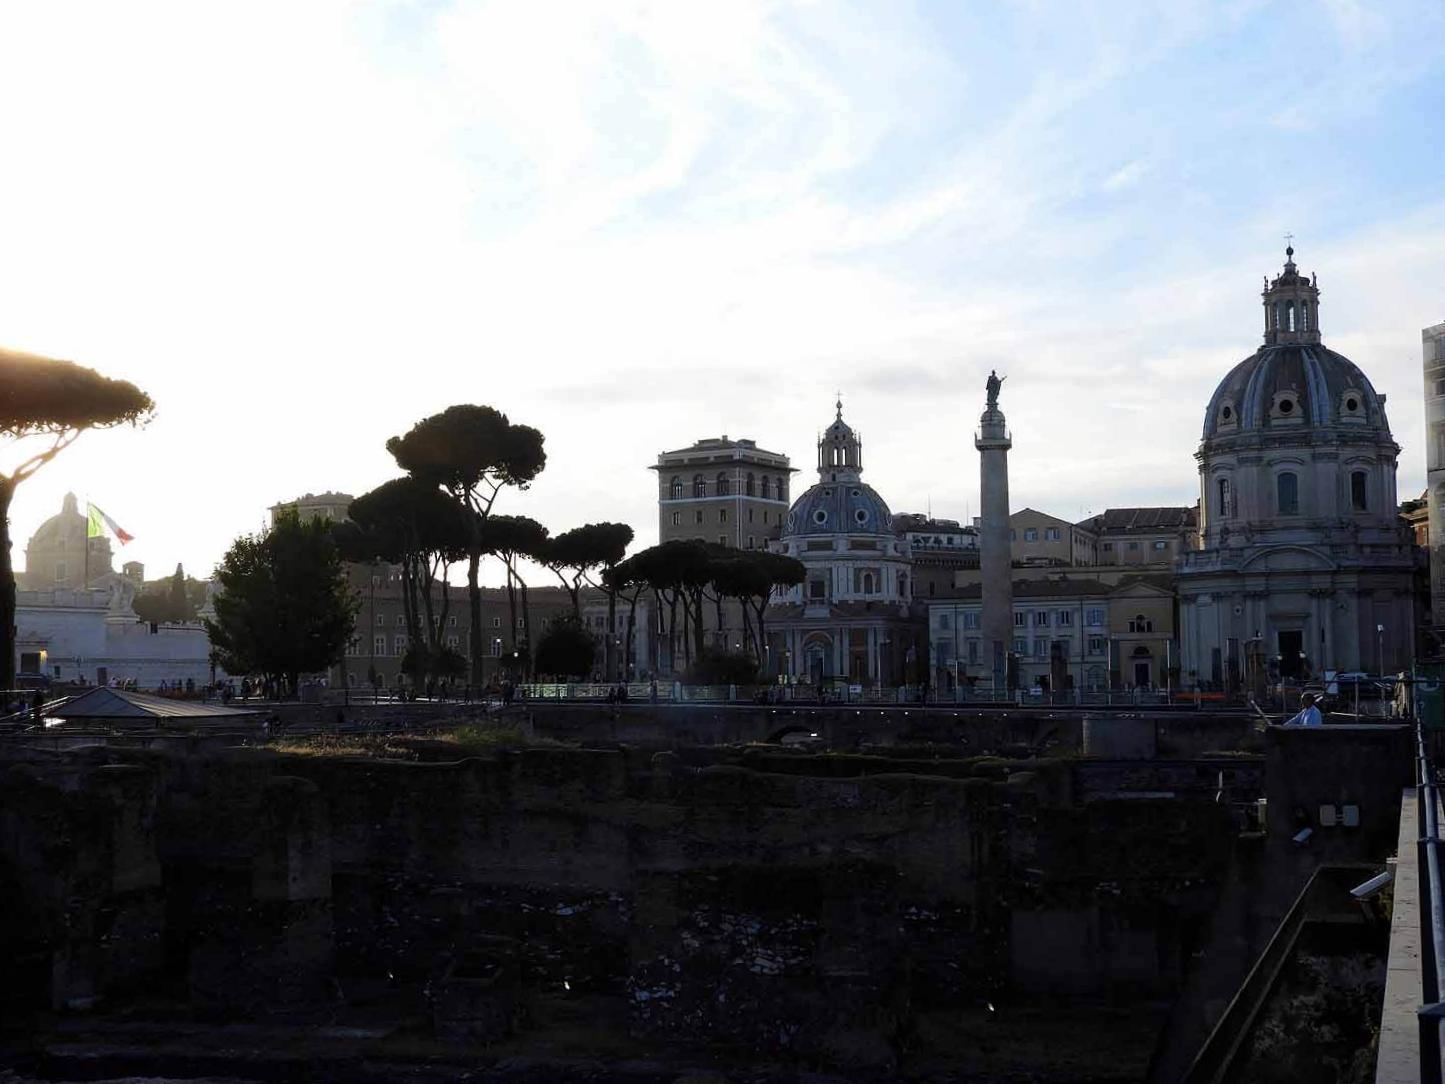 italy-italia-rome-palatino-sunset.jpg